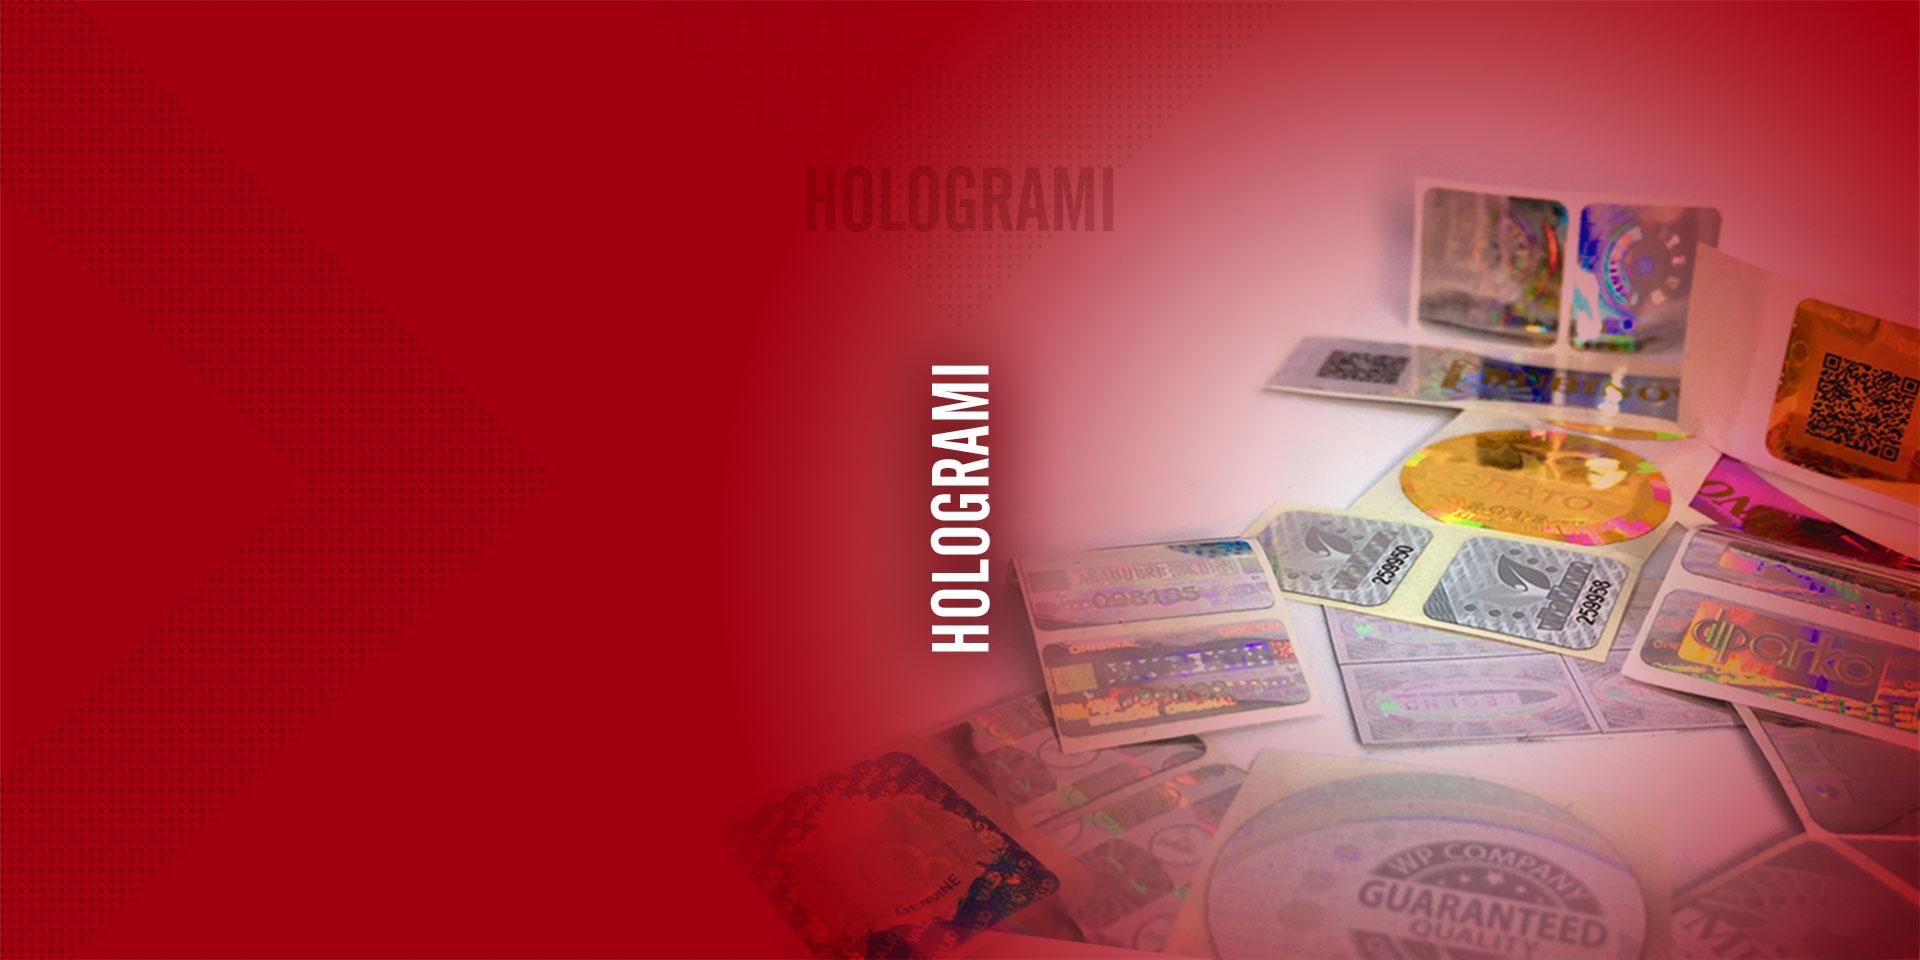 HOLOGRAMI -